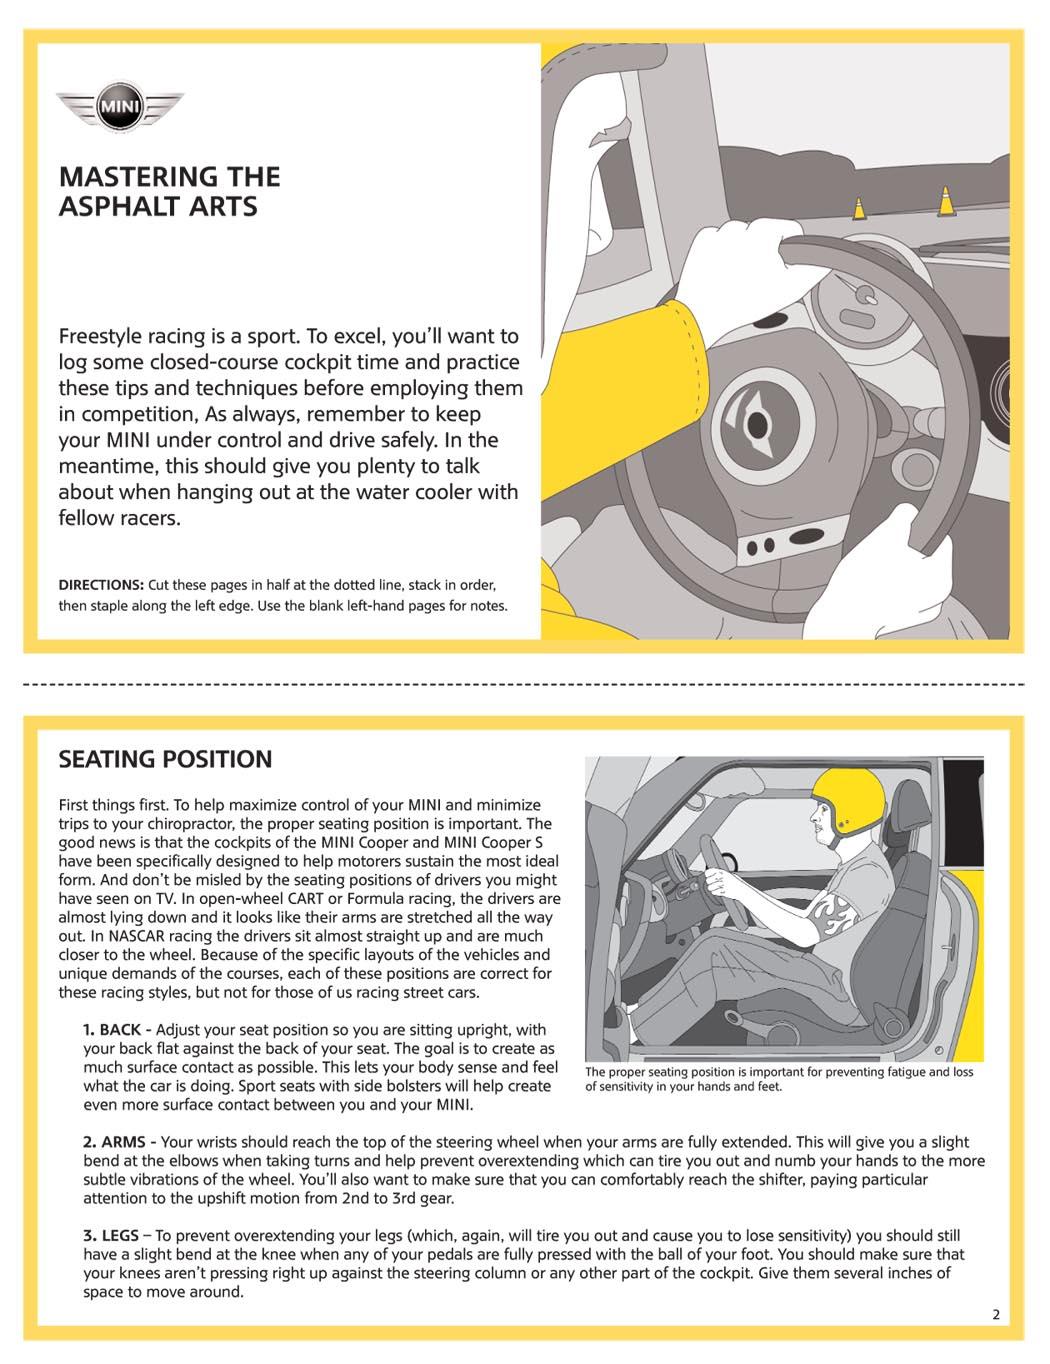 asphalt arts 1